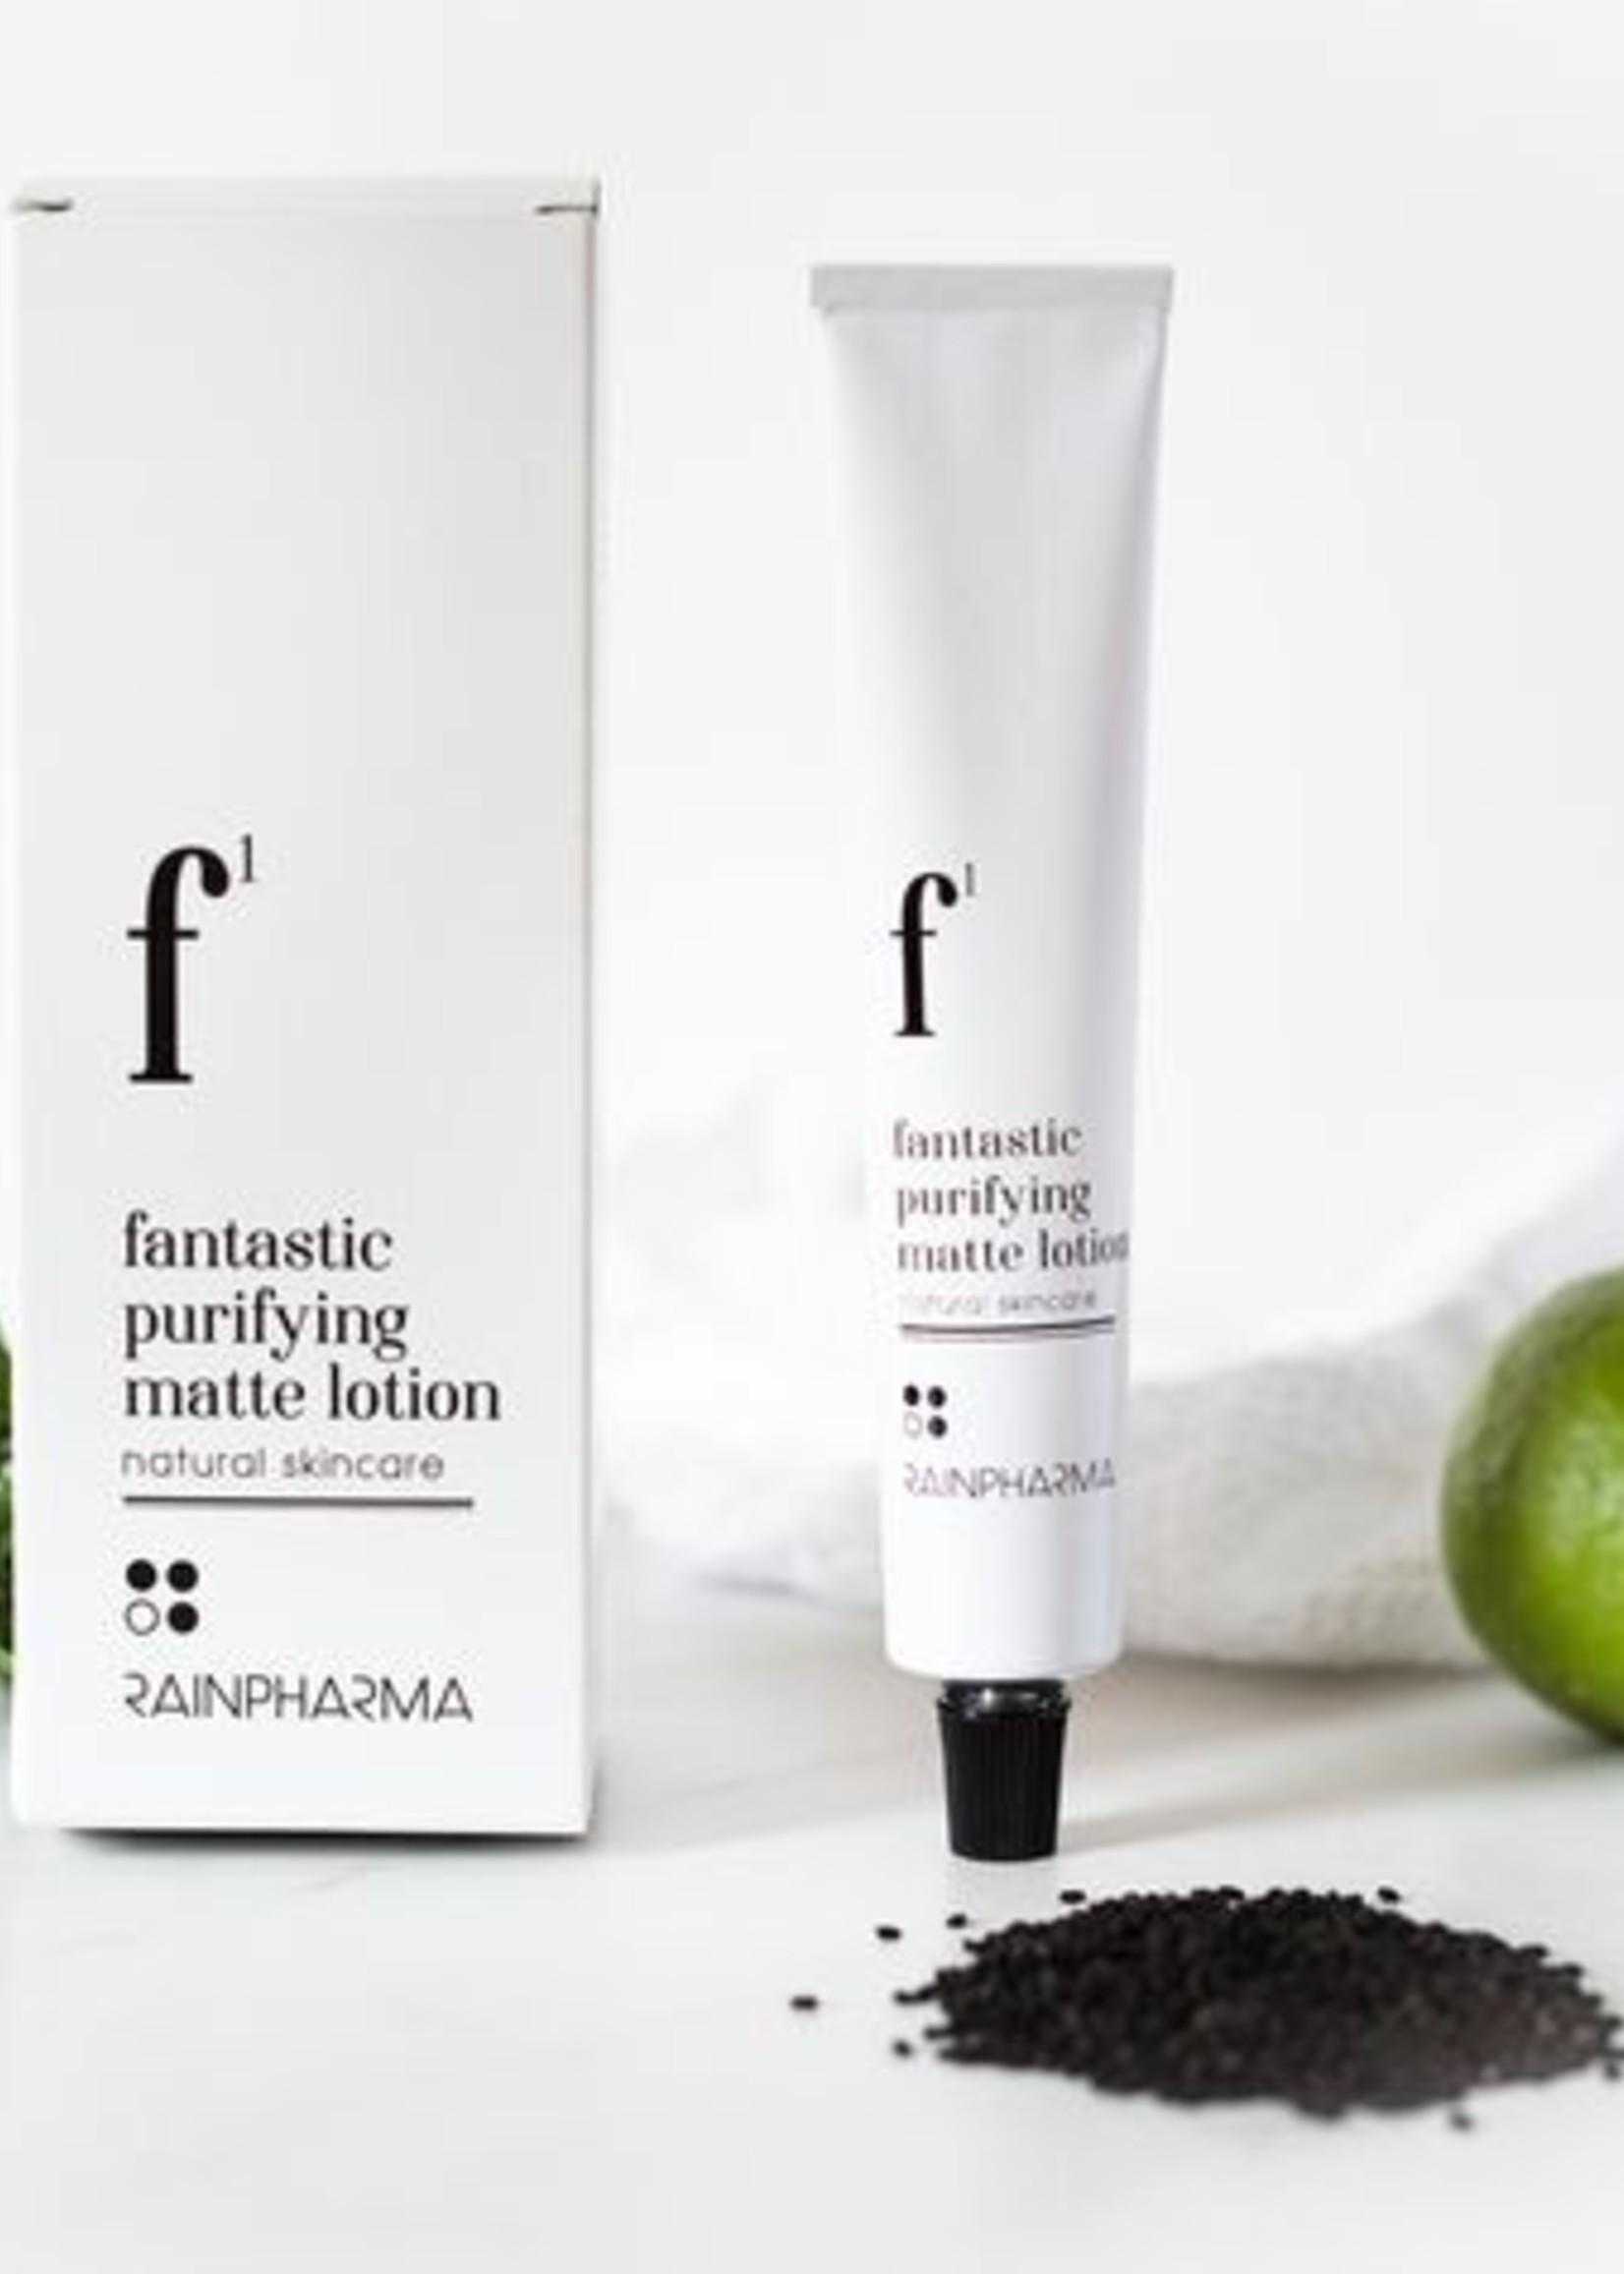 Rainpharma F1 - FANTASTIC PURIFYING MATTE LOTION